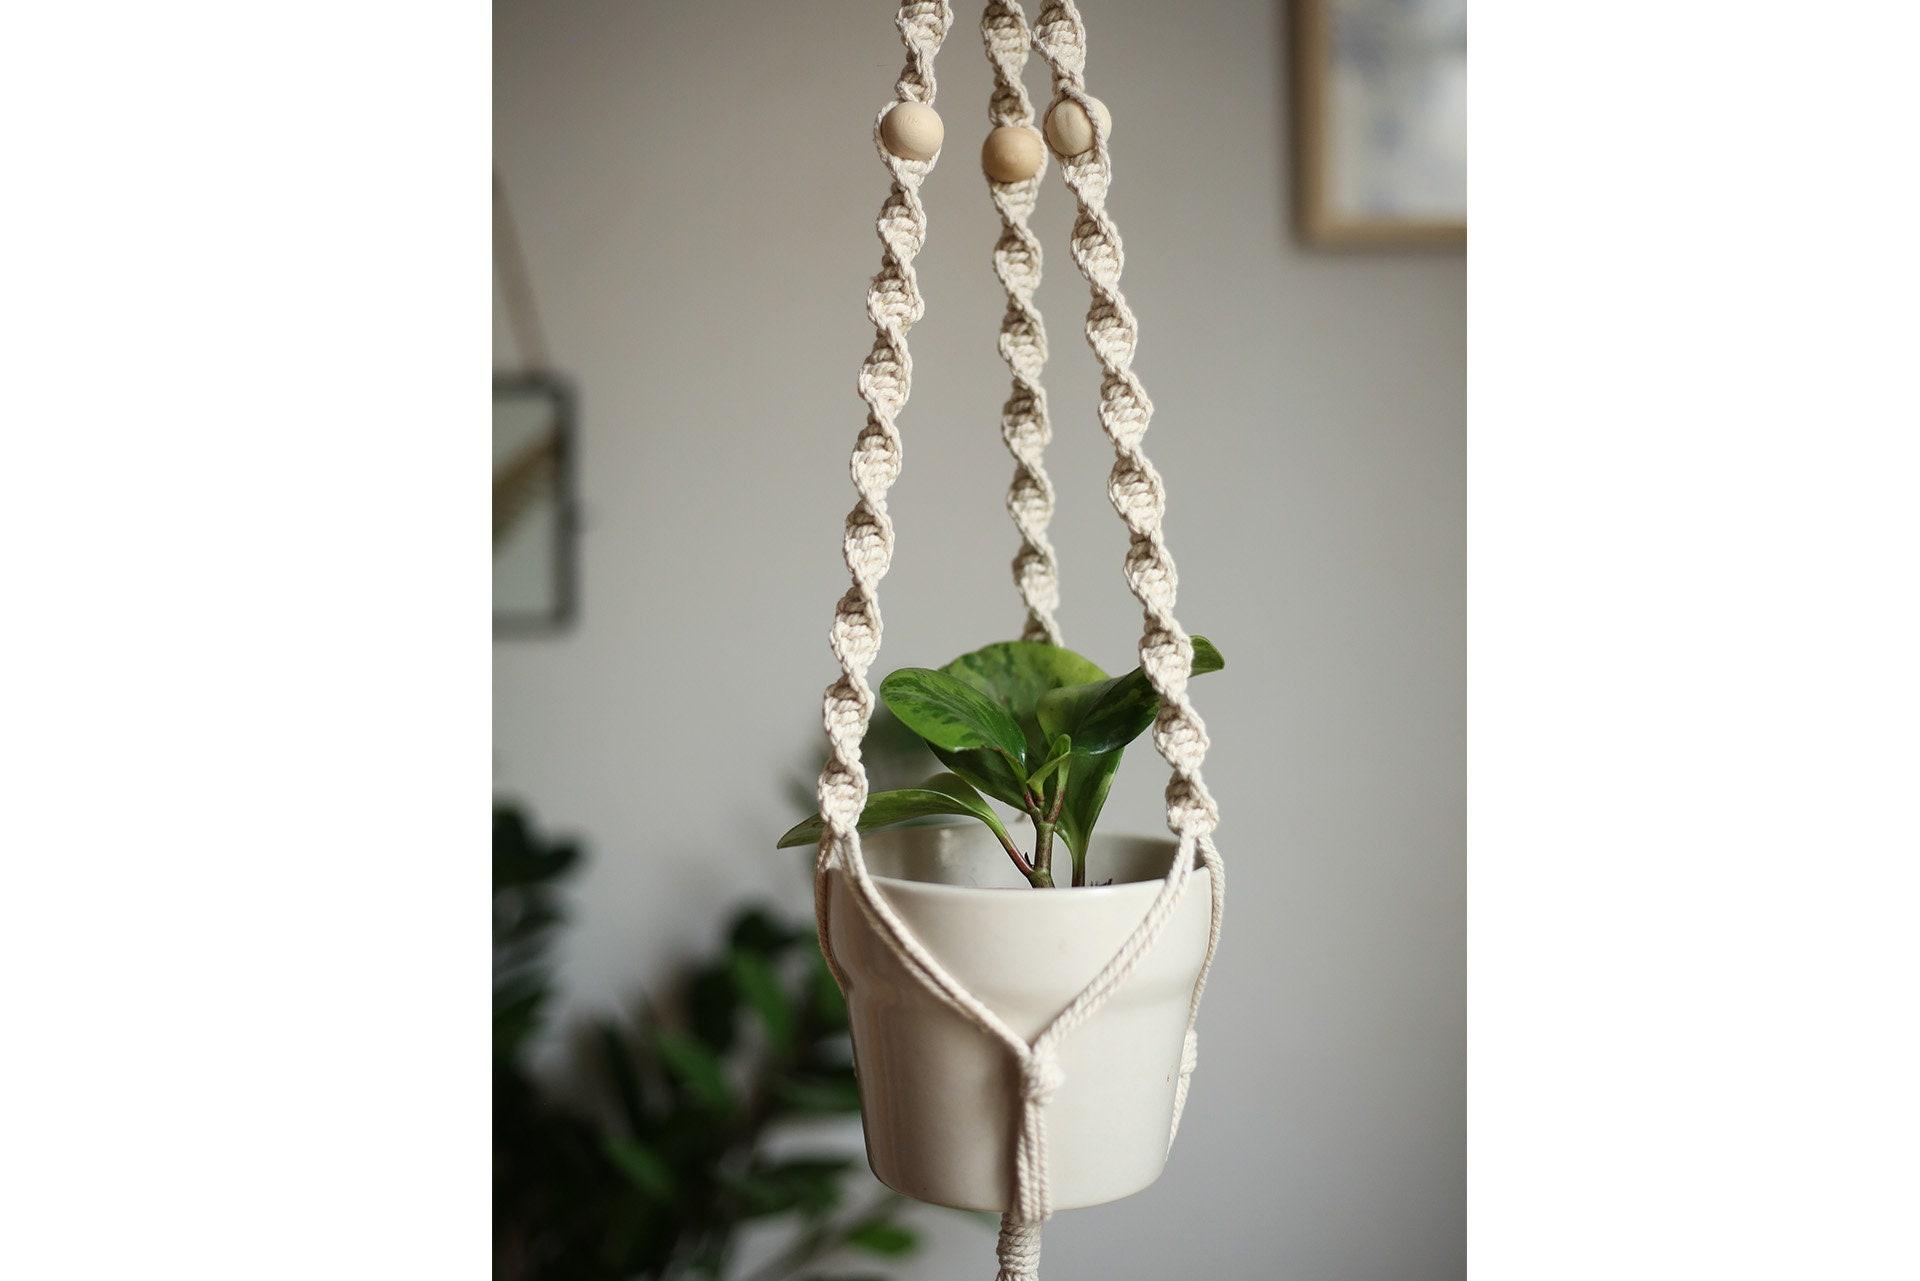 suspension en macram pour plante macrame plant hanger. Black Bedroom Furniture Sets. Home Design Ideas